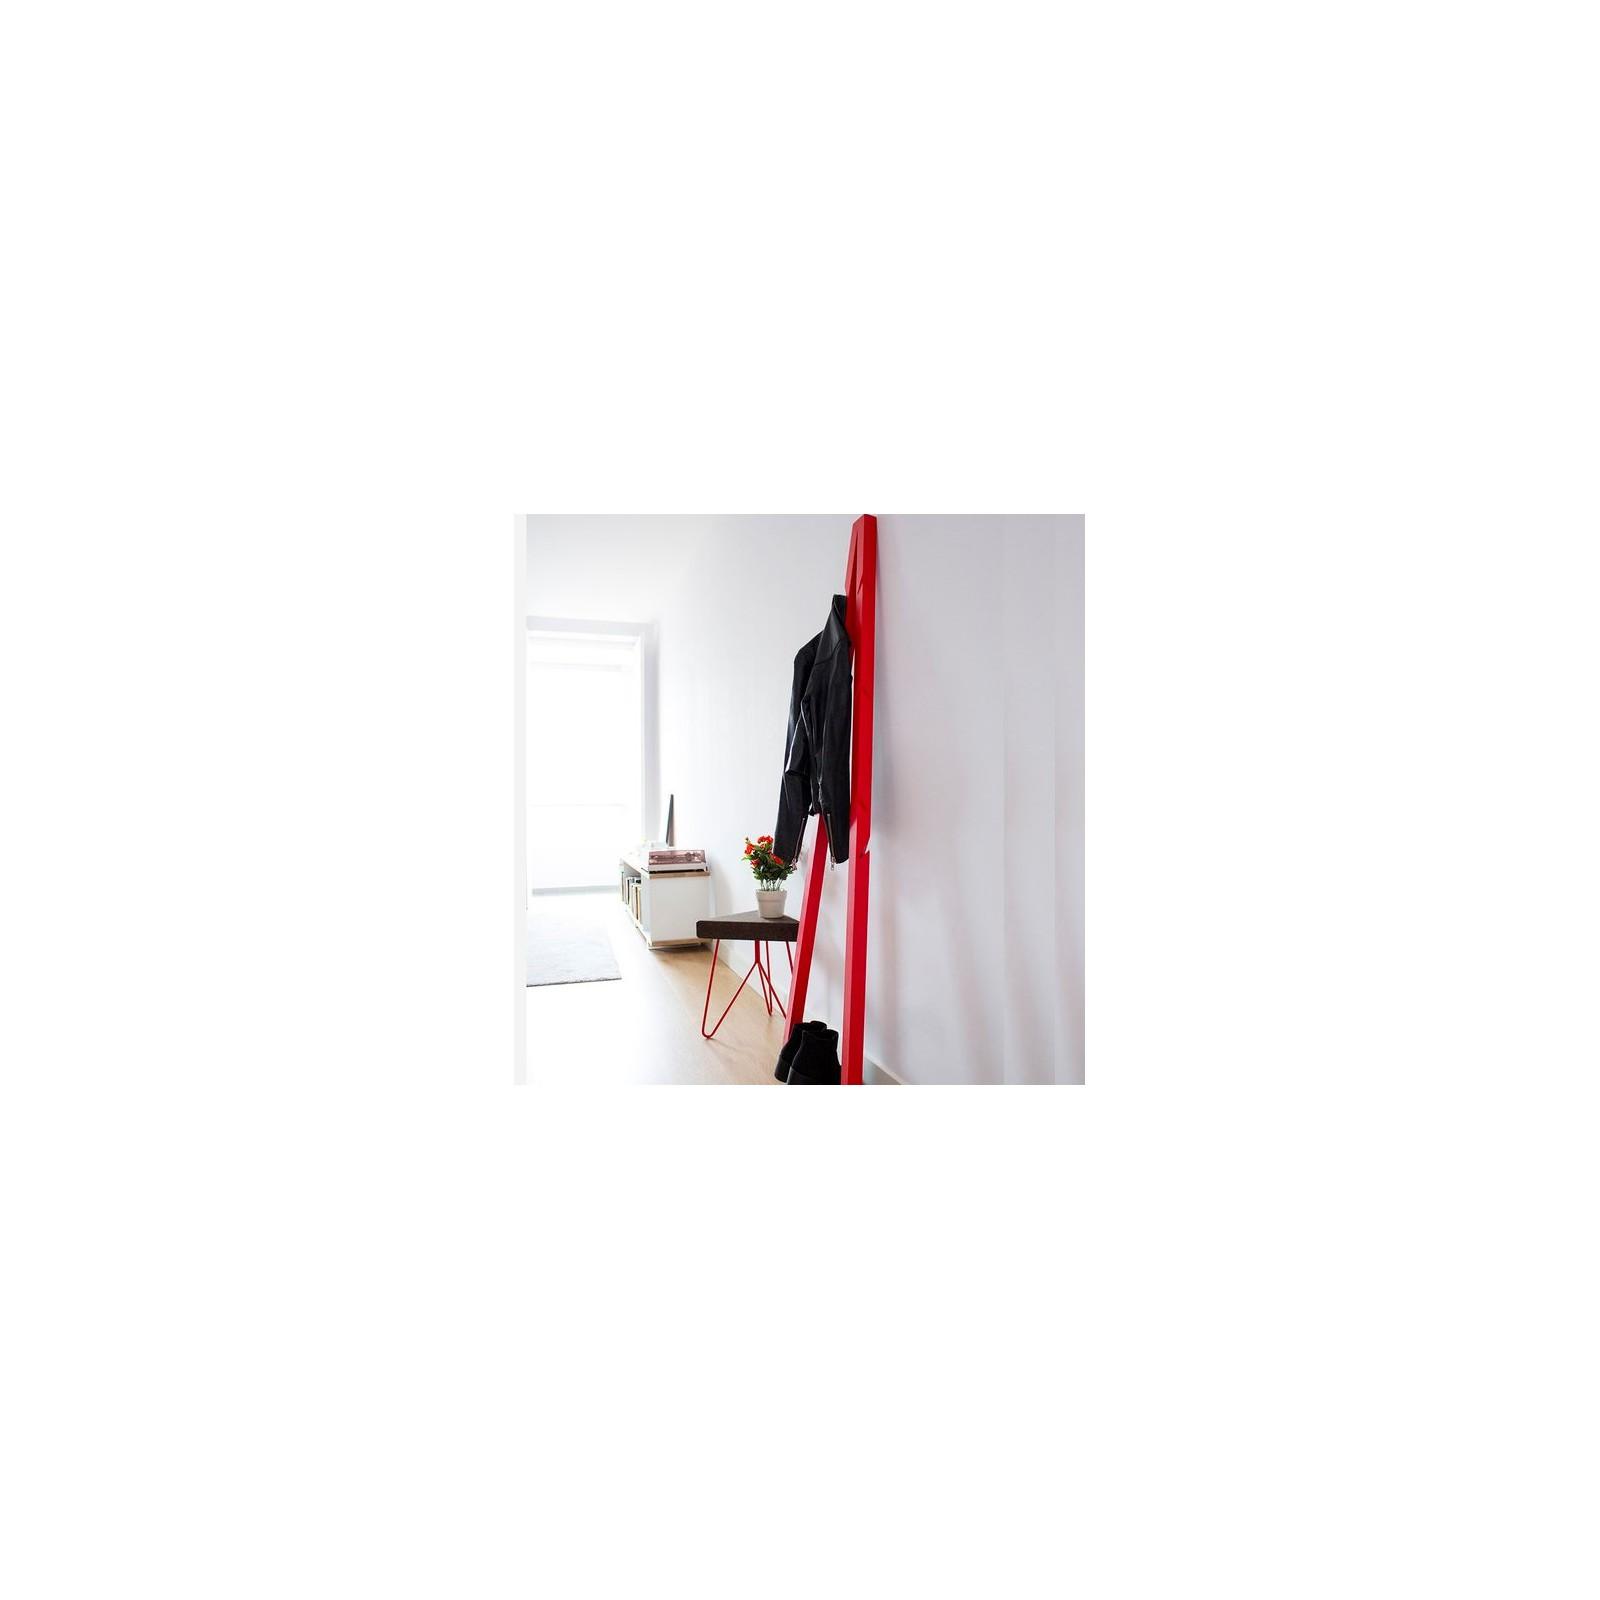 porte manteaux triangle rouge arne concept. Black Bedroom Furniture Sets. Home Design Ideas